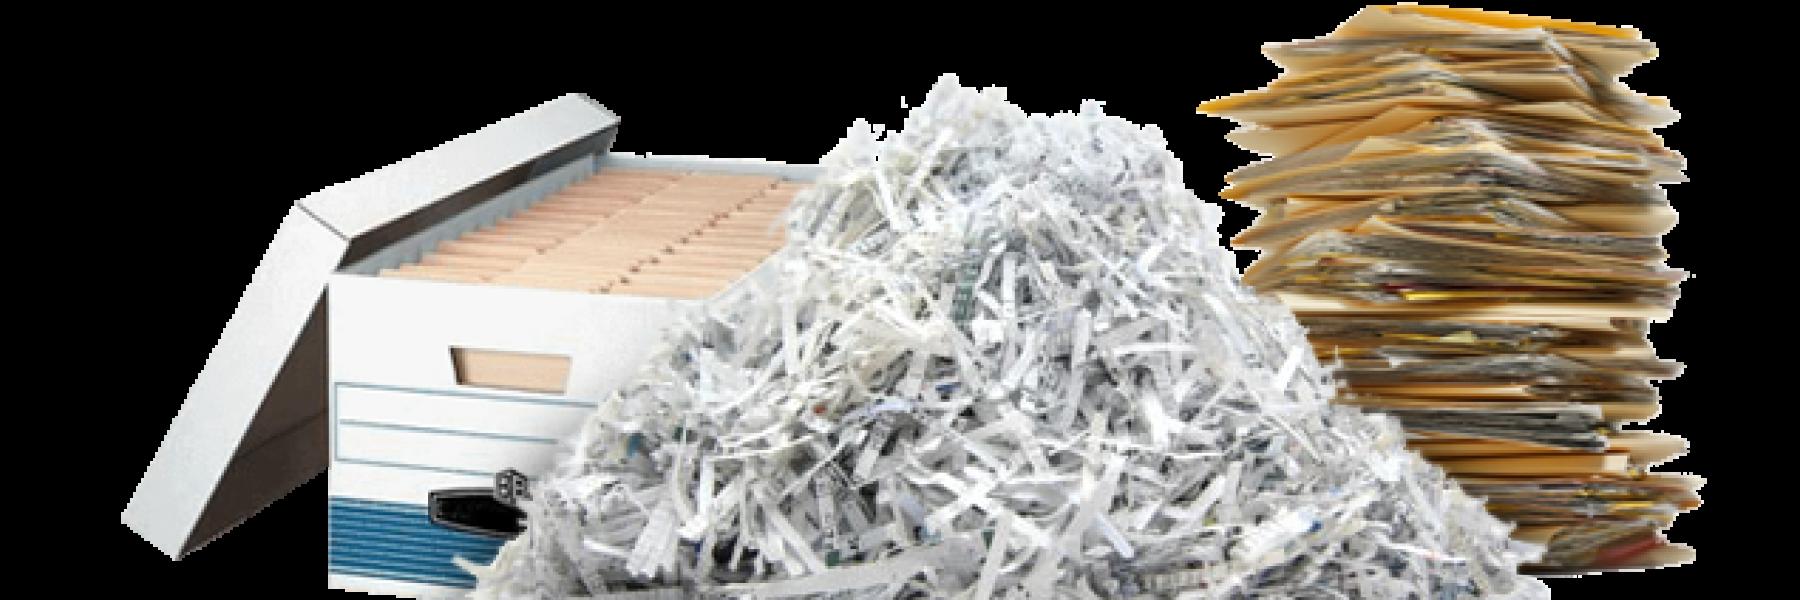 Paper shredding boston